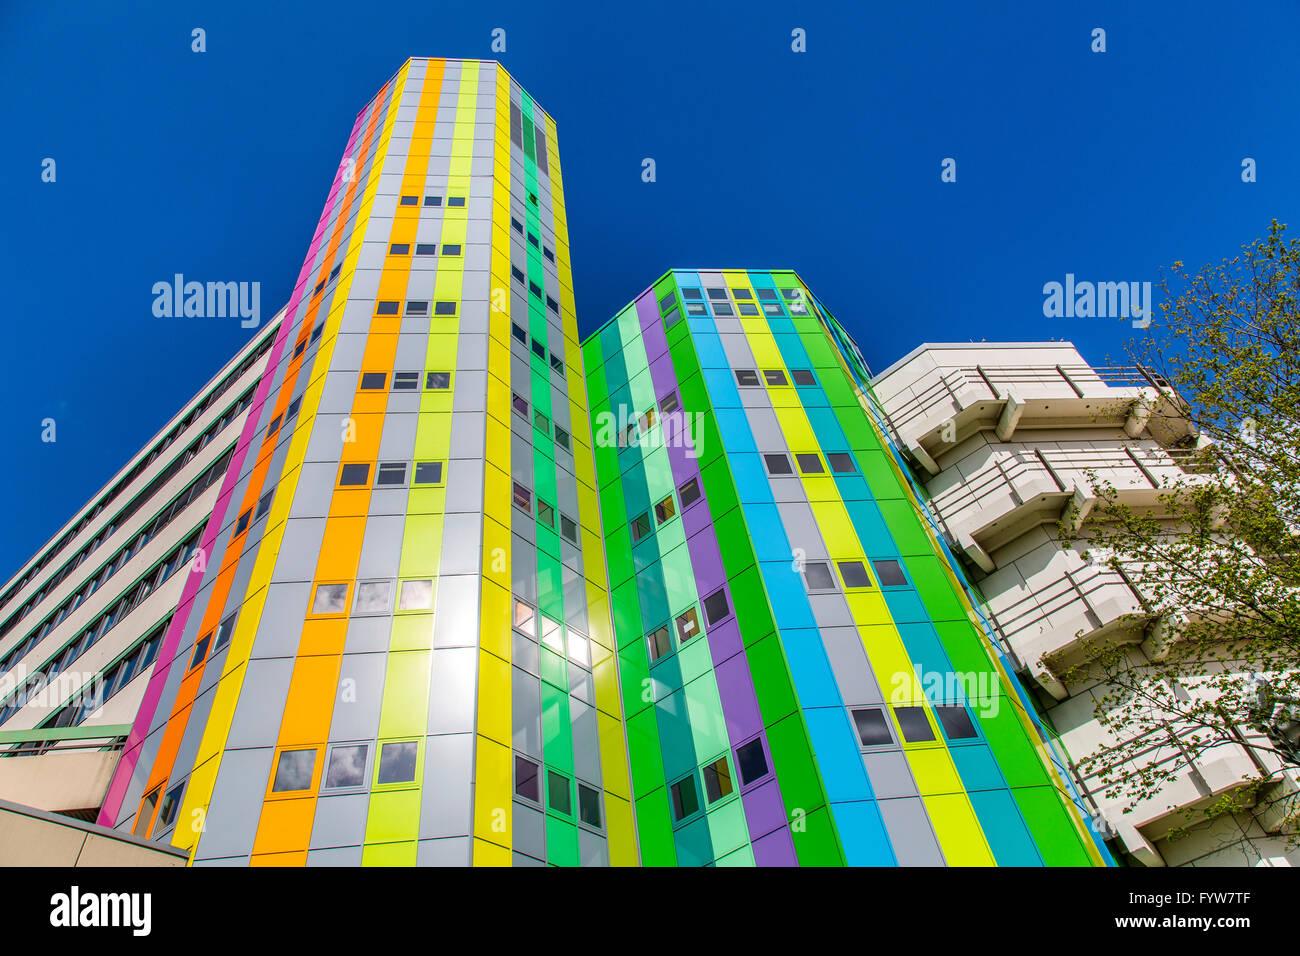 University of Essen, Campus, administrative buildings, - Stock Image